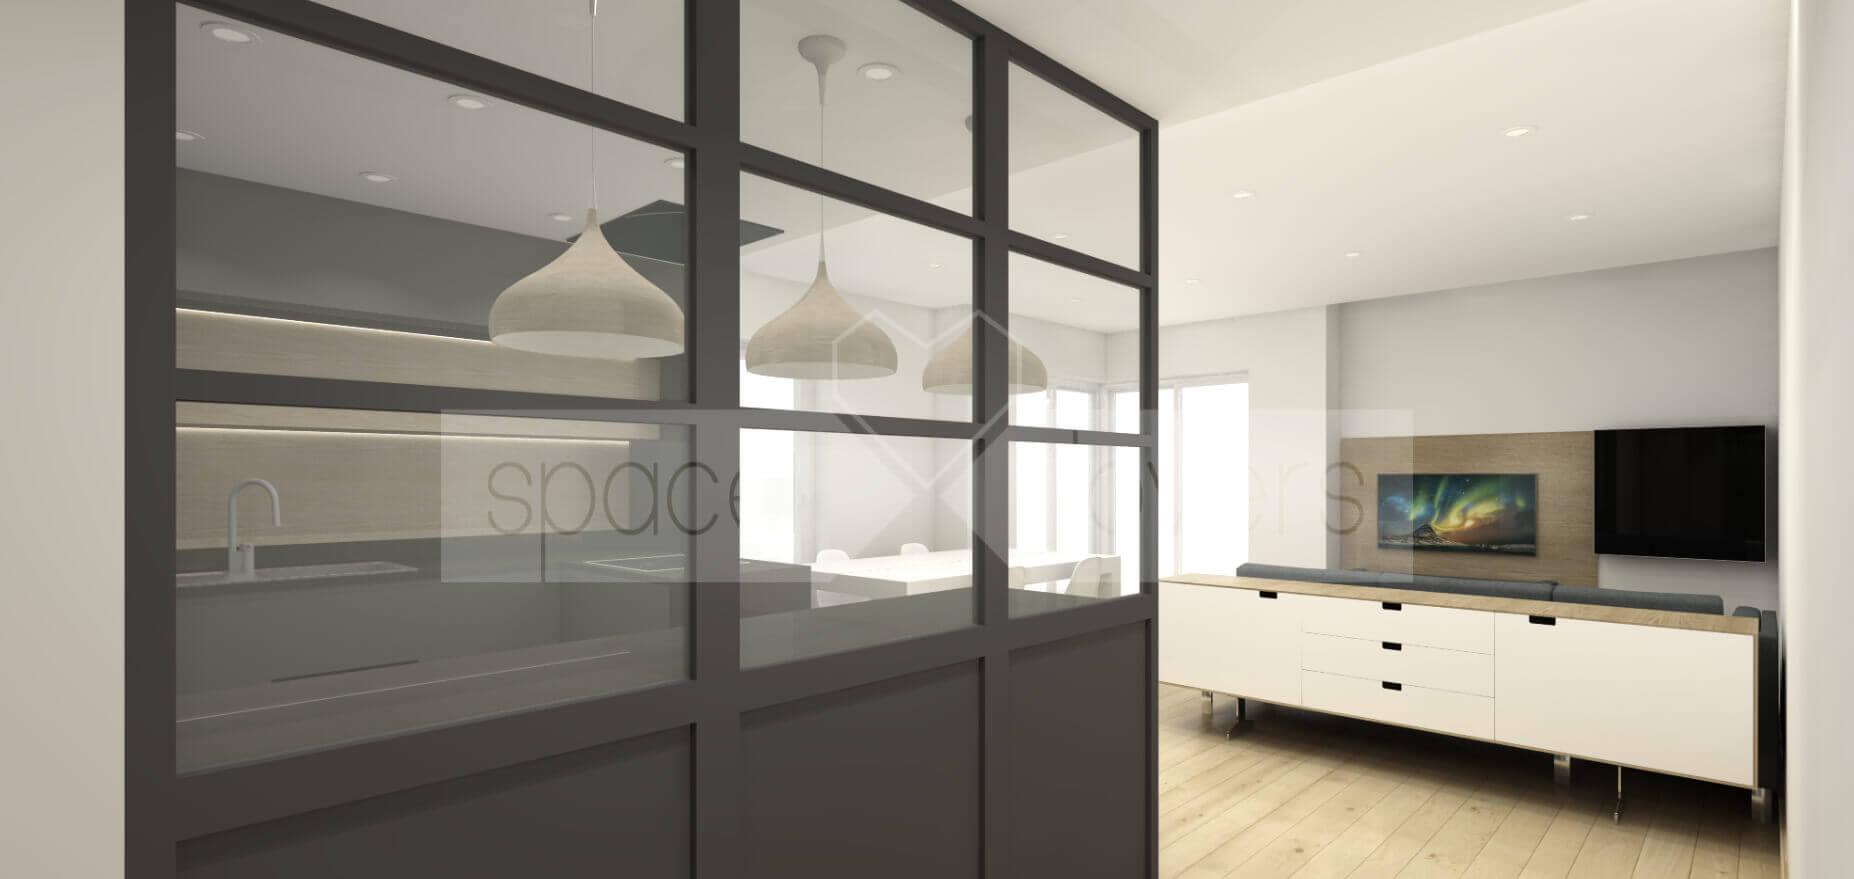 remodelacao-apartamento-parque-das-nacoes-lisboa-cozinha-industrial-sala-hall